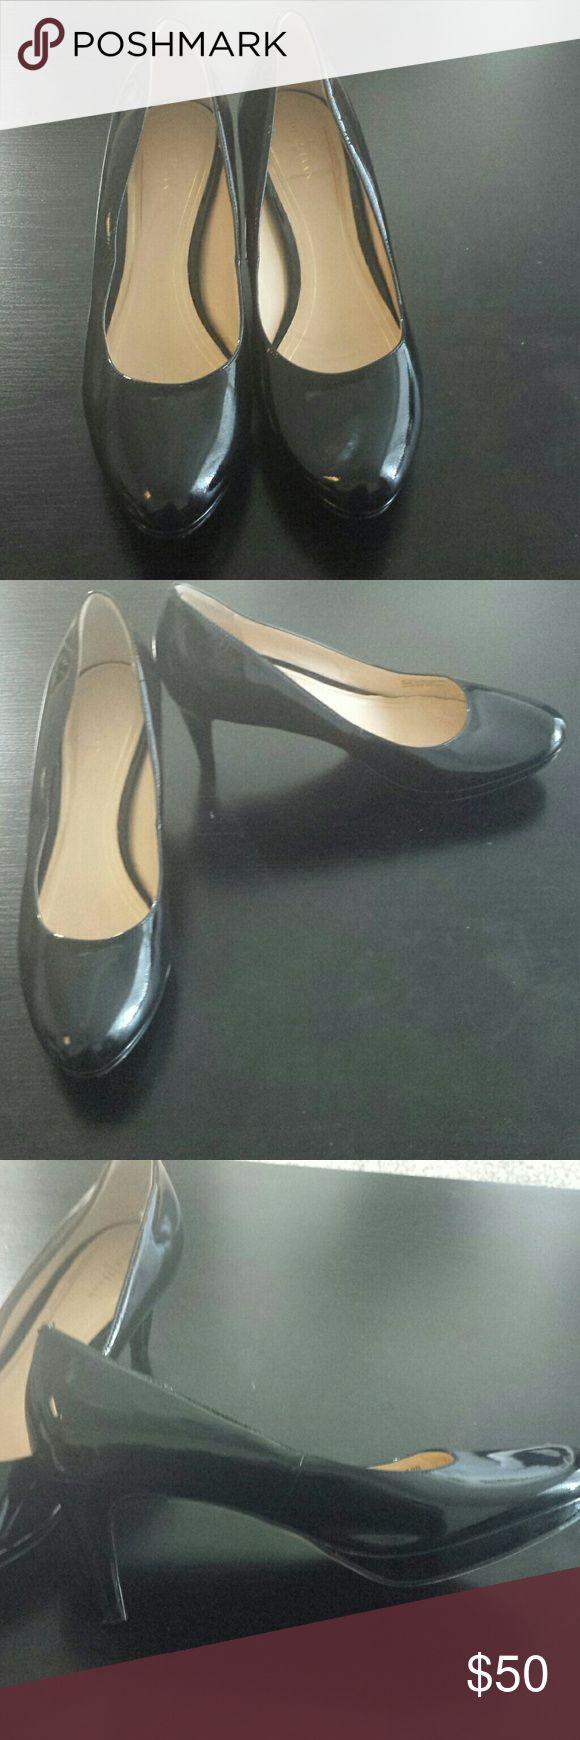 "Cole Haan Nike Air platform black heels size 9 EUC Cole Haan Nike Air platform black patent leather pumps. Approximate 3"" heel. Size 9 Cole Haan Shoes Heels"